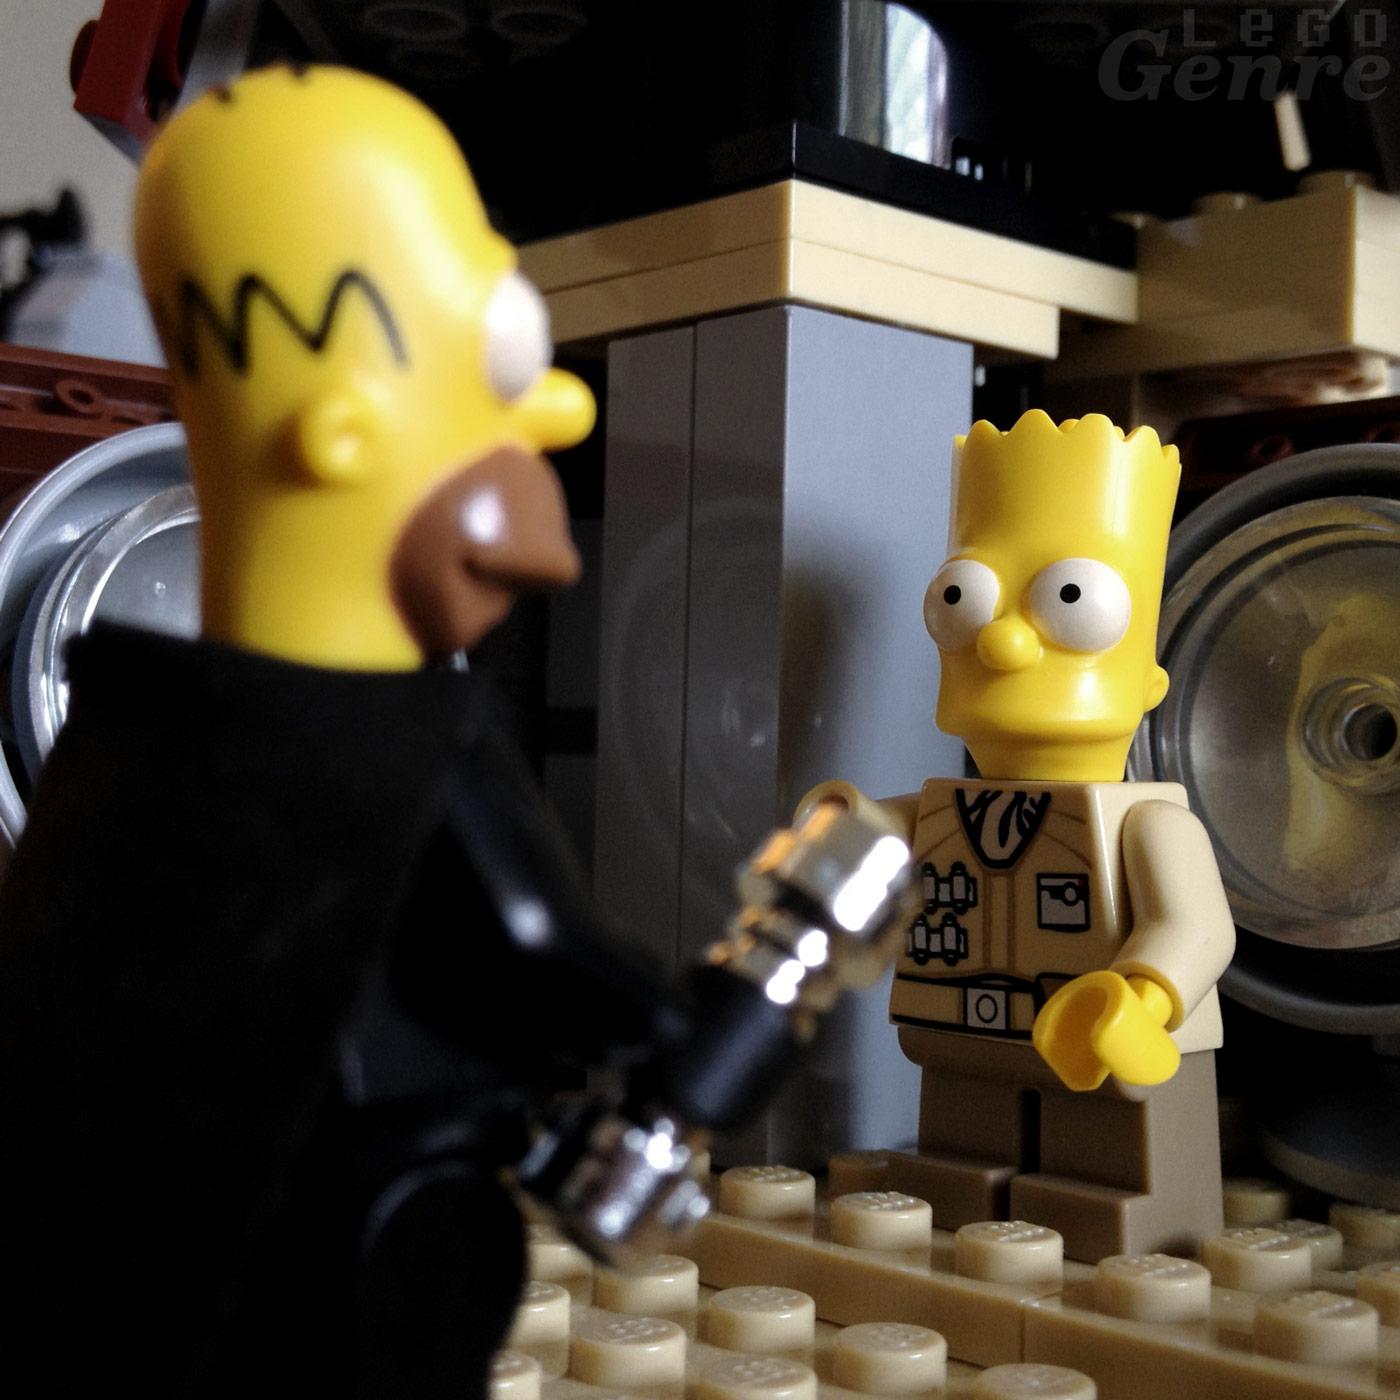 LegoGenre 00383: Bart, I Am Your Father.